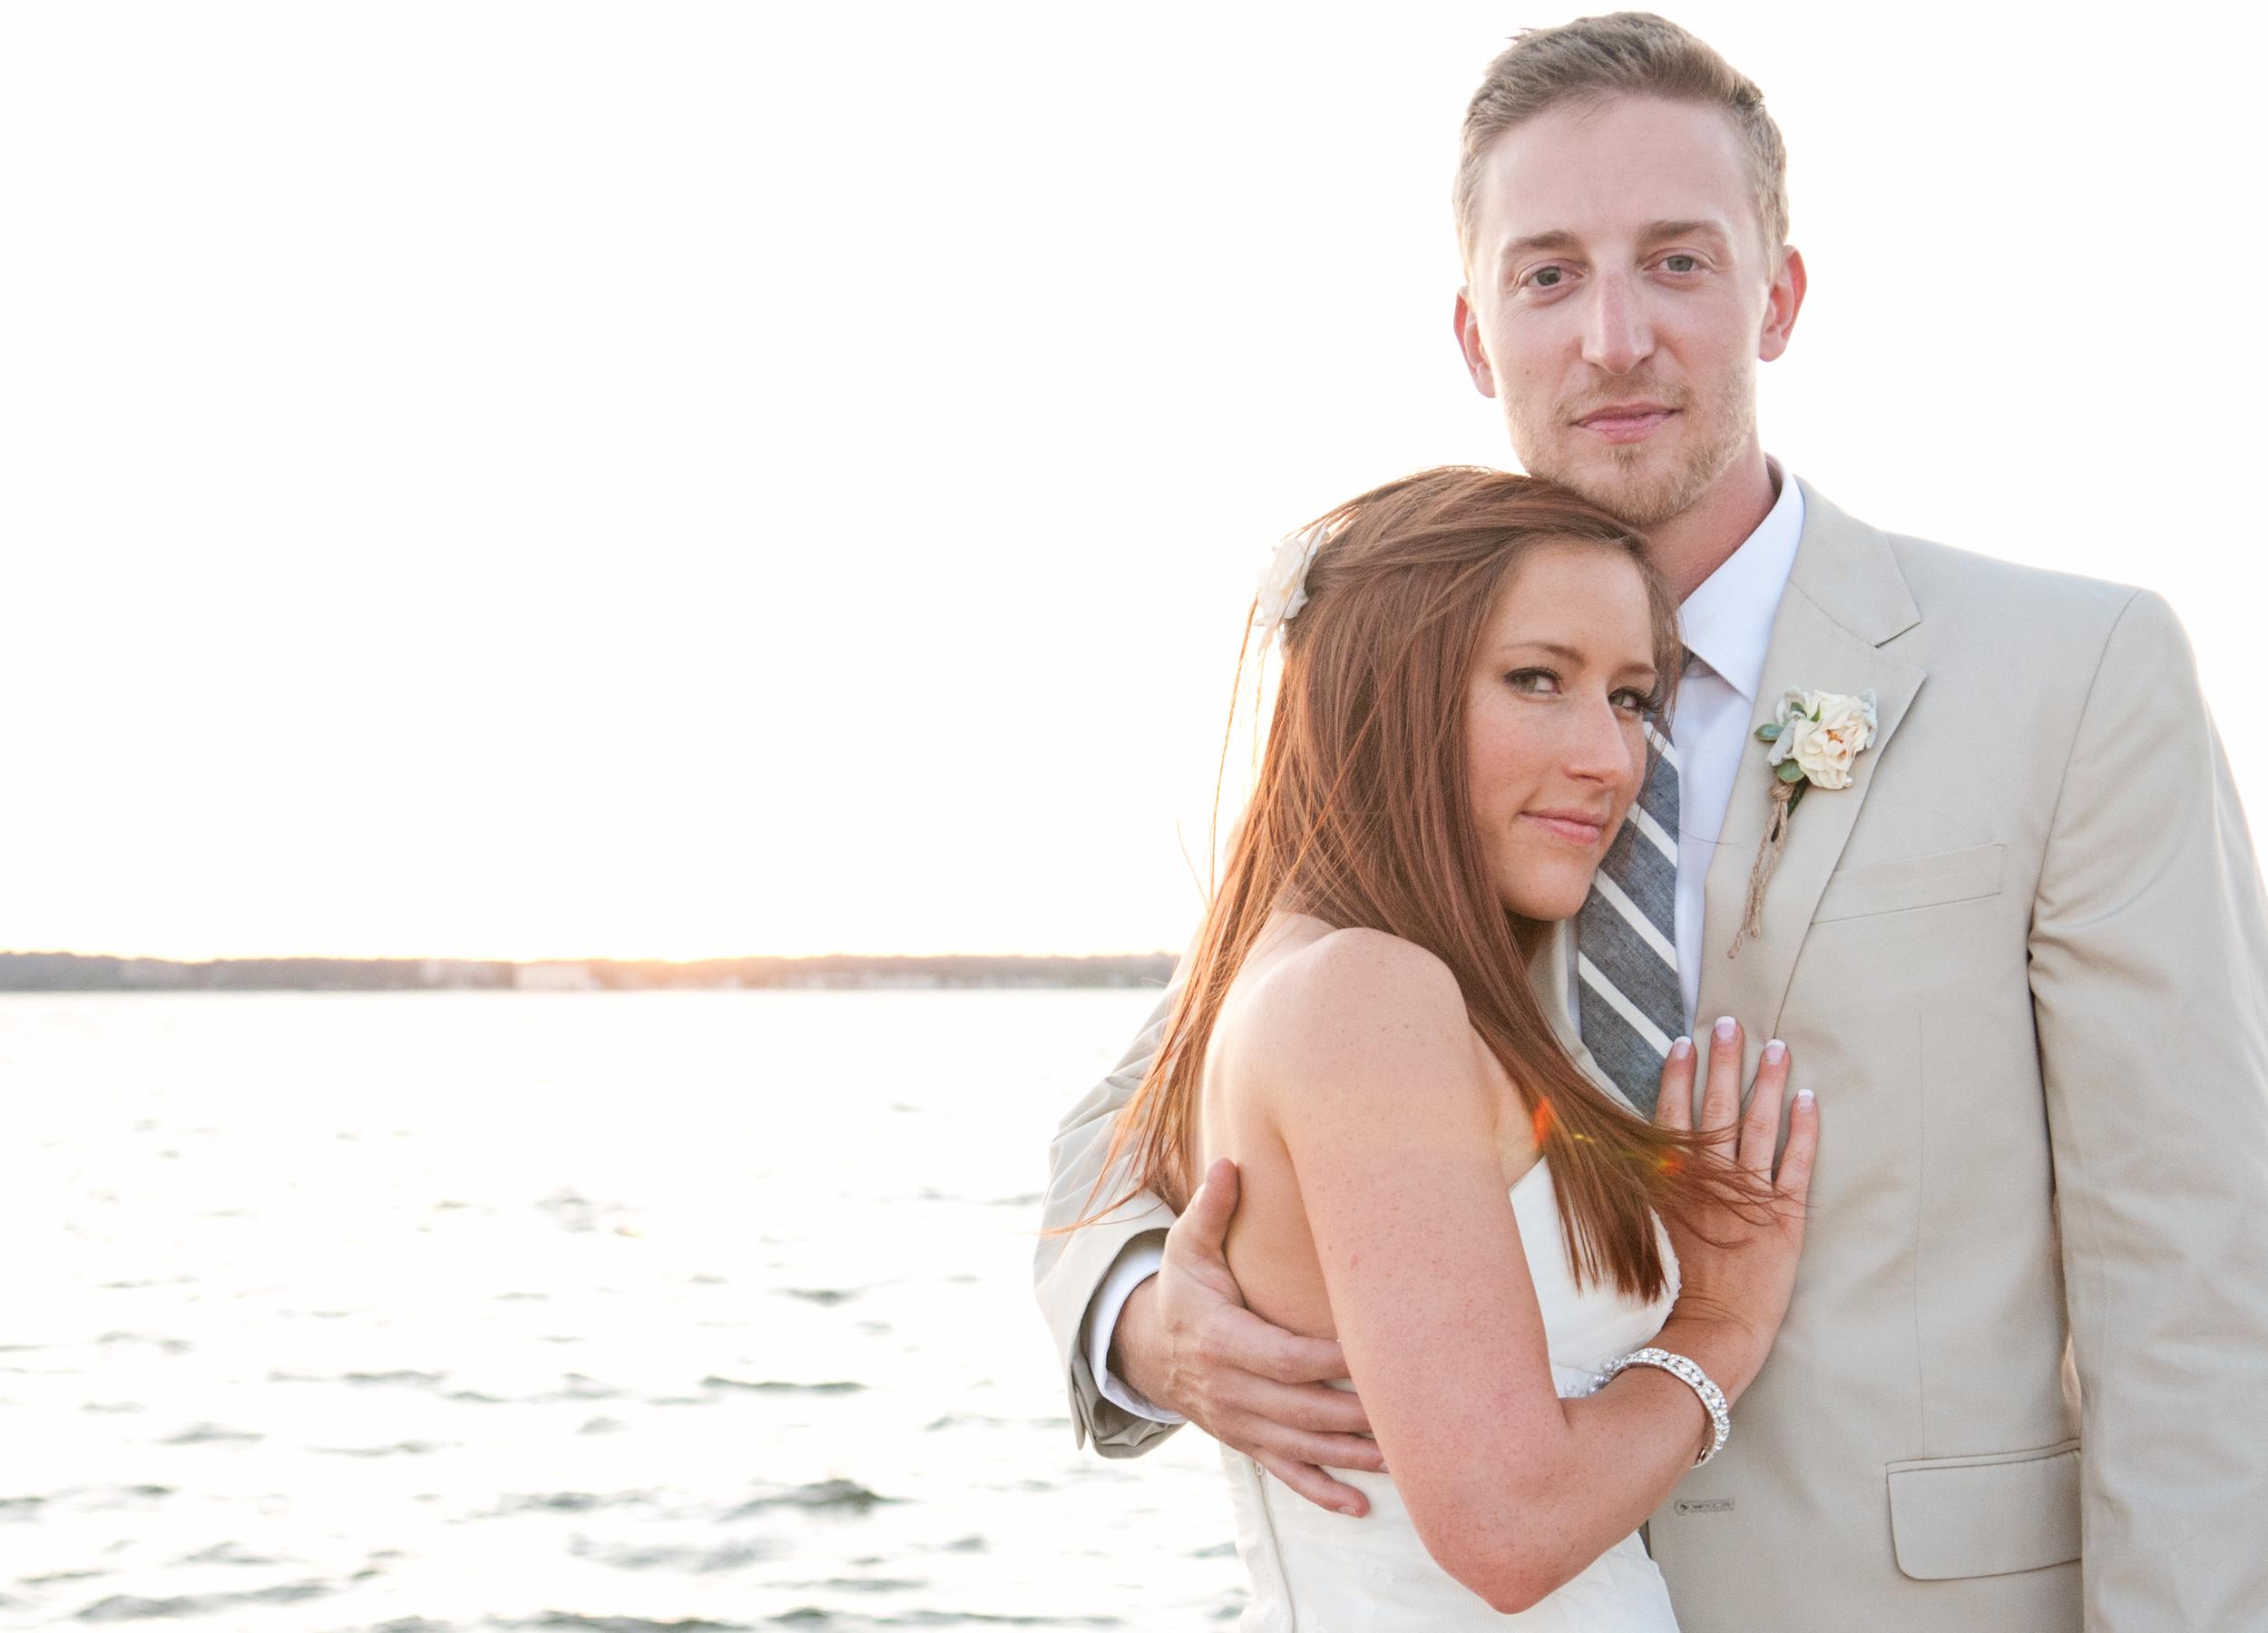 Angela_Chicoski_CT_wedding_photographer_074.jpg